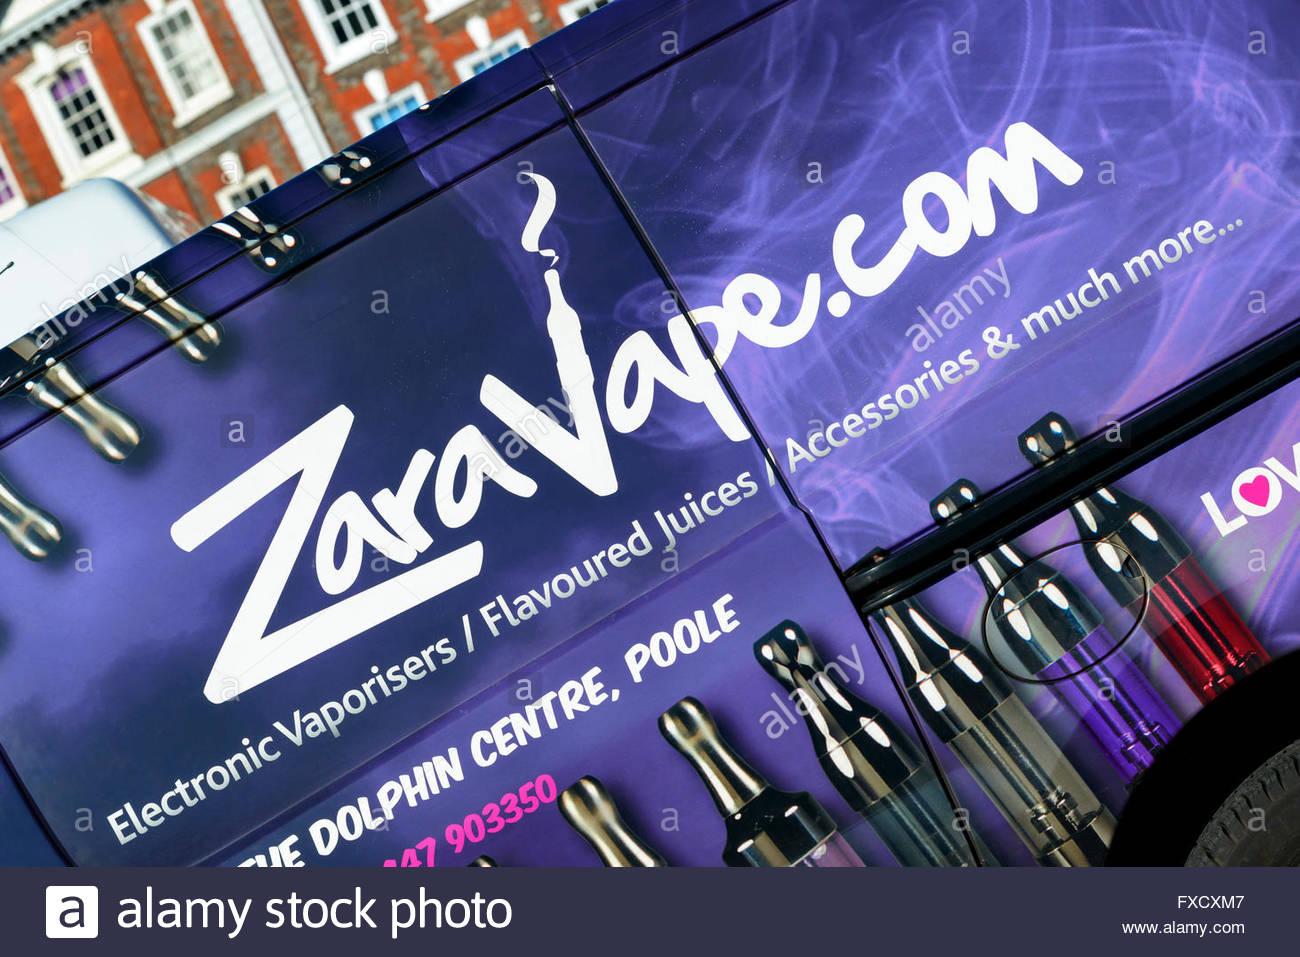 Zaravape delivery van, Blandford, Dorset, England, UK - Stock Image